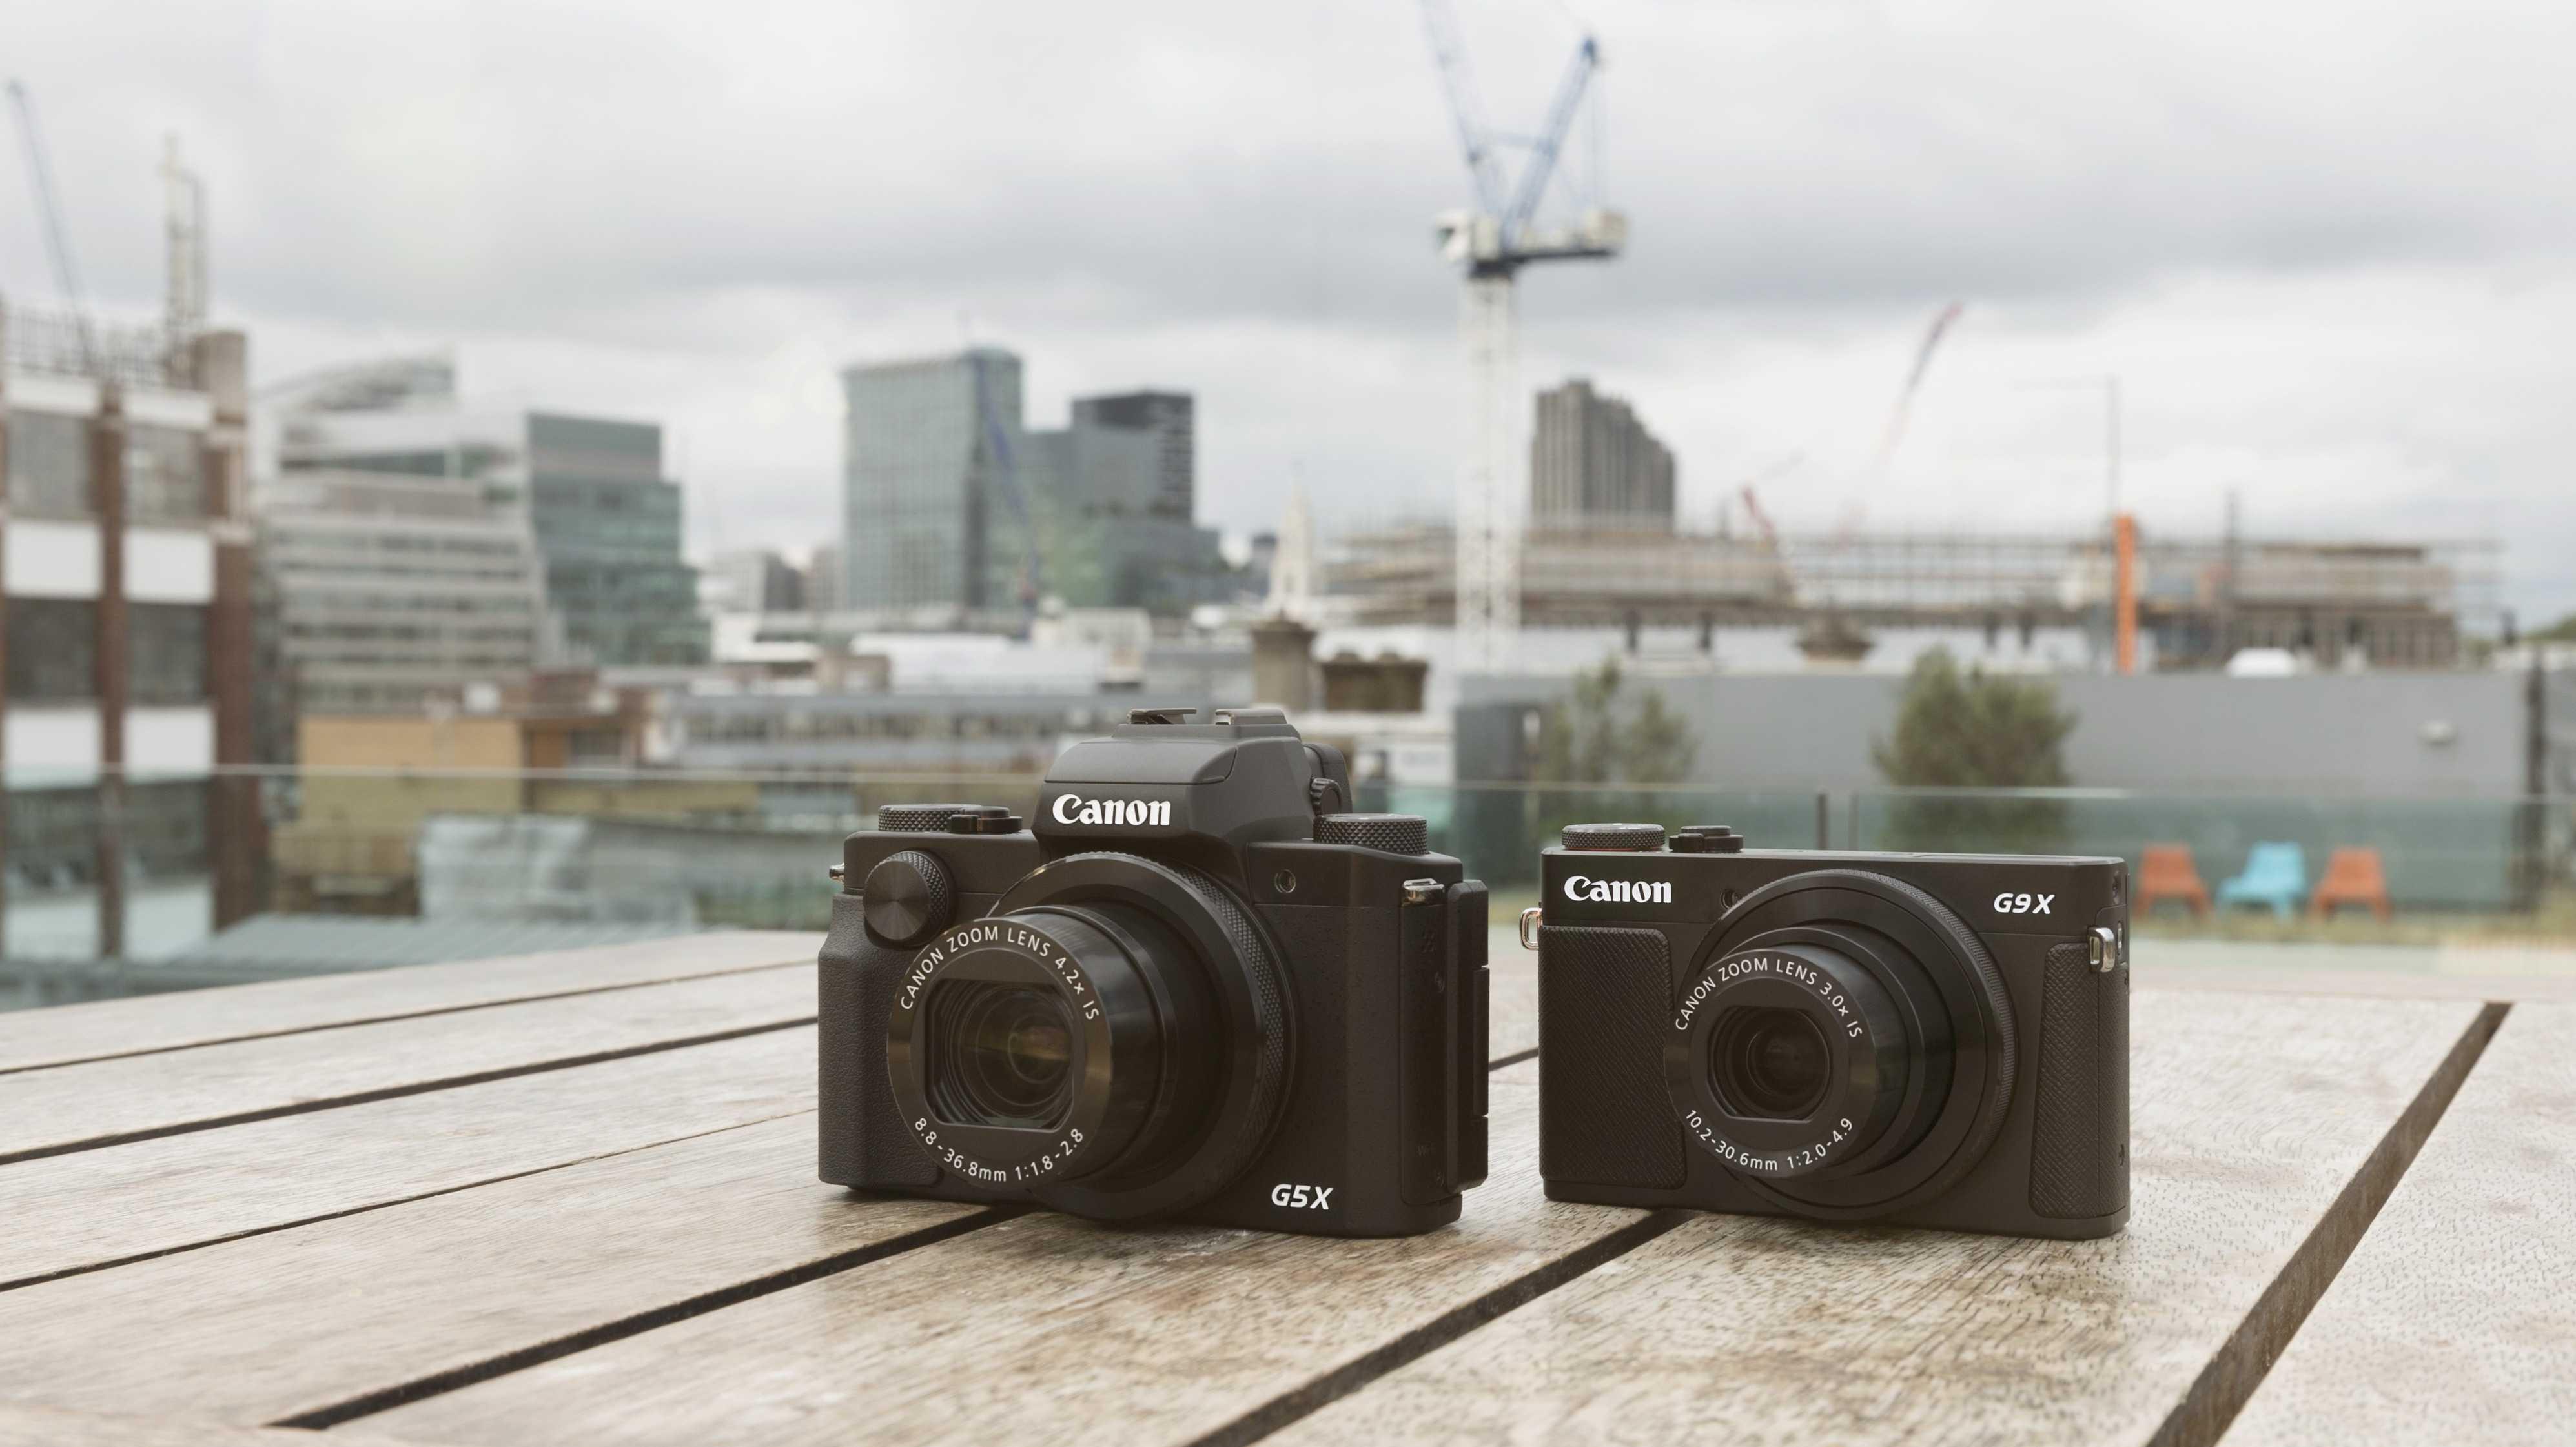 Canon Neue Powershot Kompaktkamera Mit Groem Sensor Ct Fotografie G5x Kamera Pocket